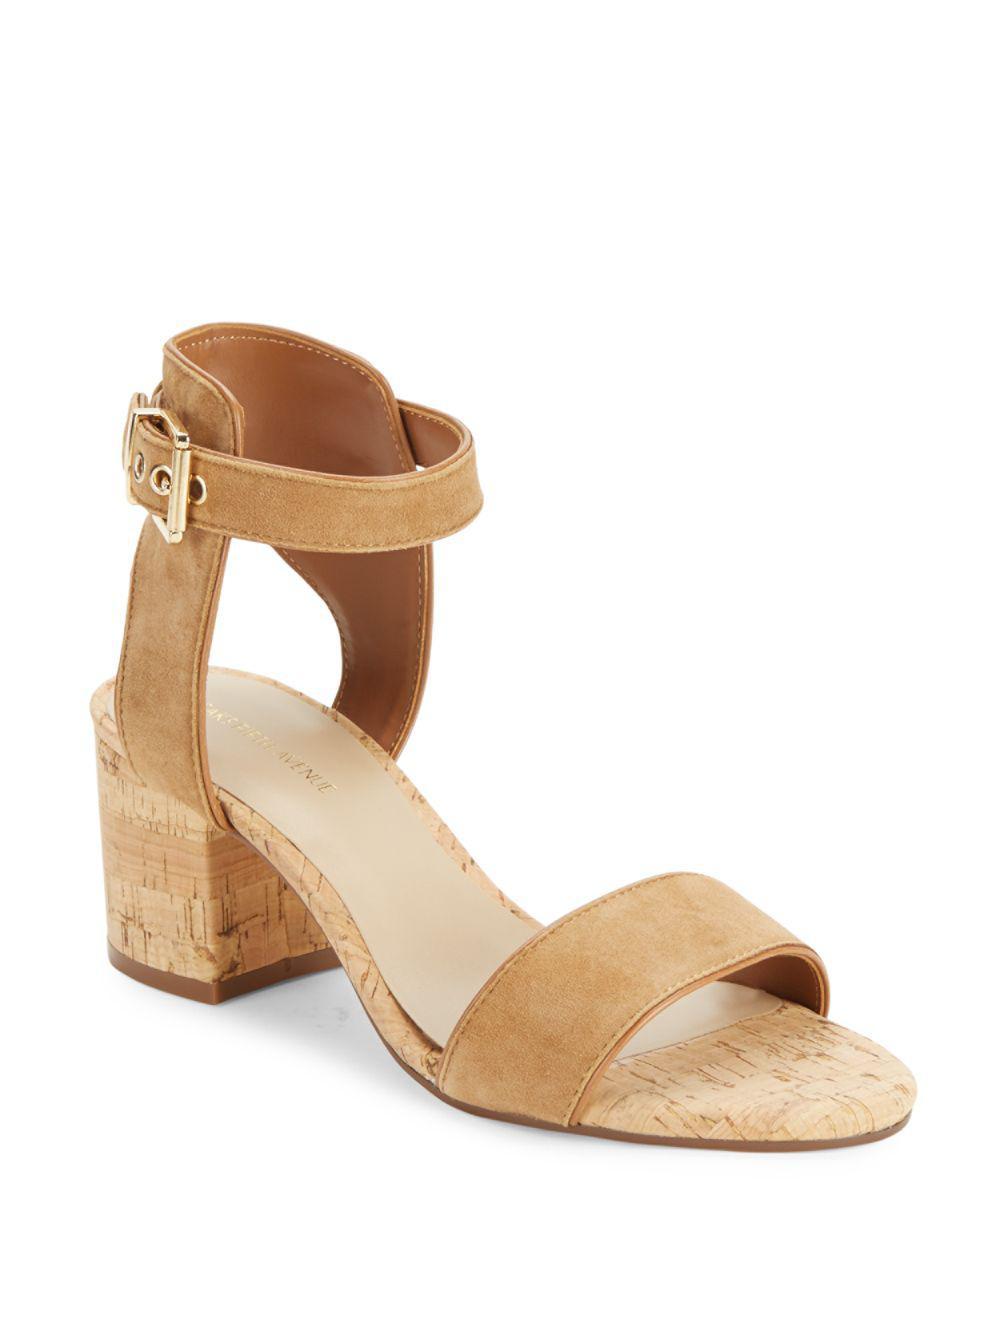 66288bd0a7e5 Lyst - Saks Fifth Avenue Helaine Cork Sandals